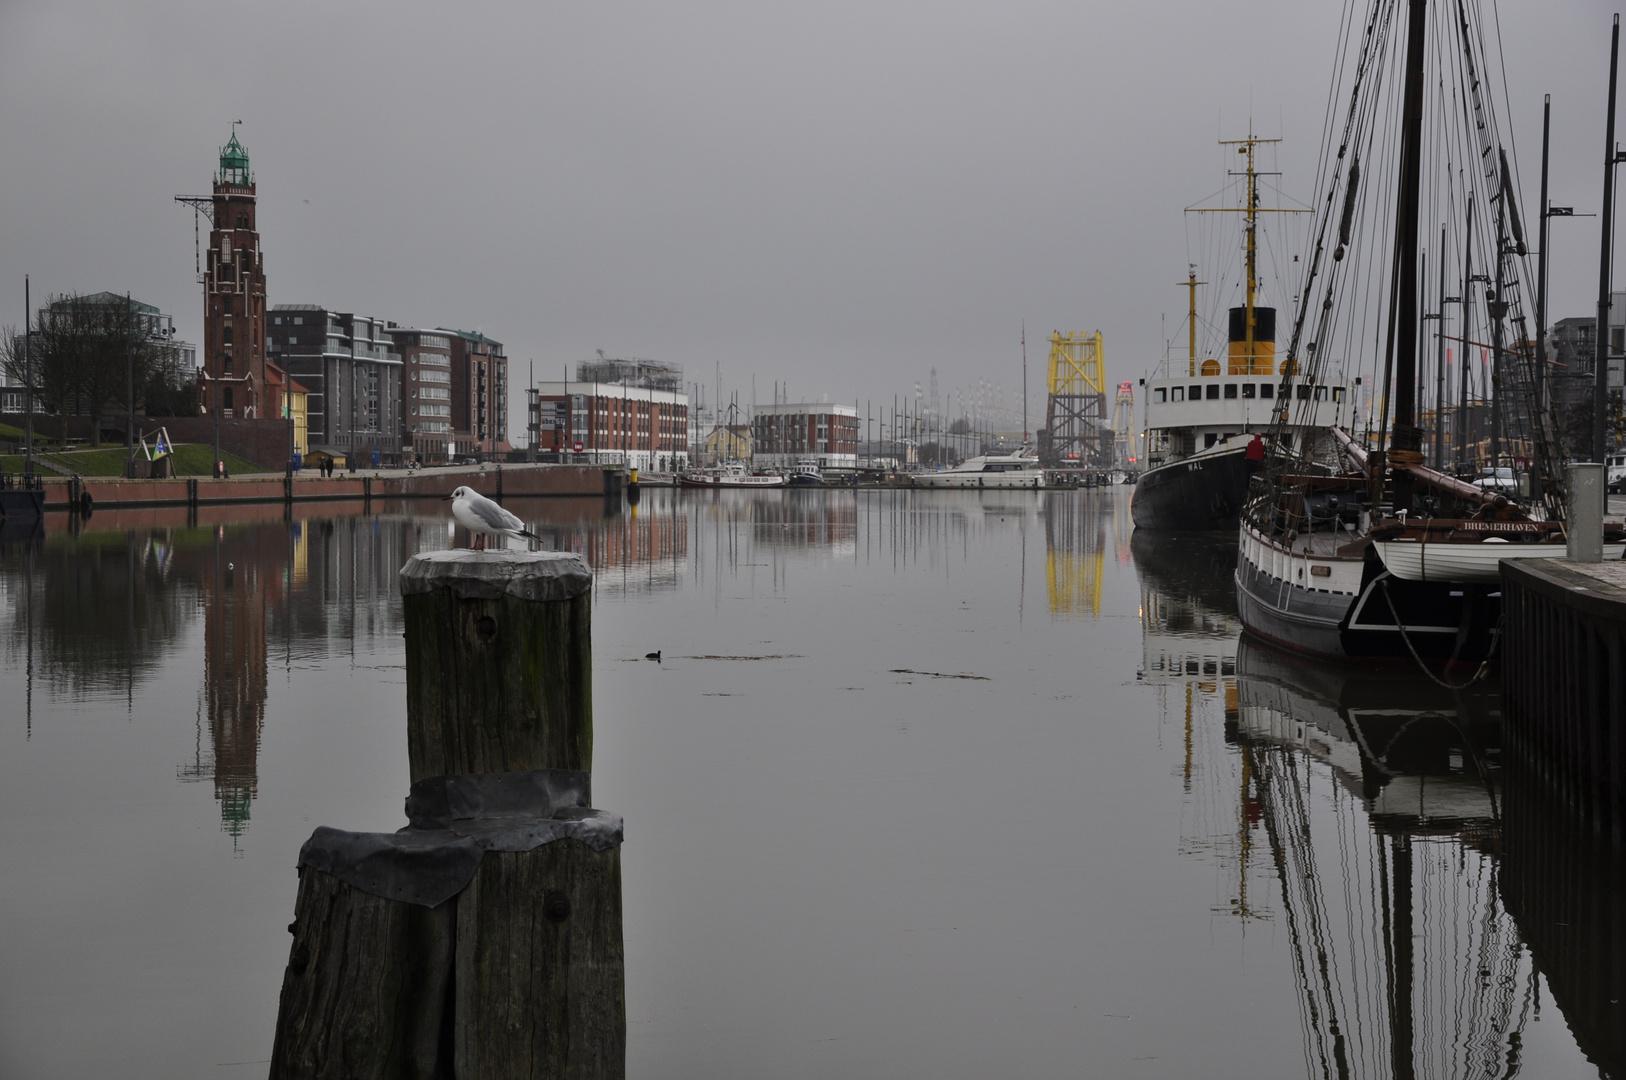 --- Bremerhaven ---